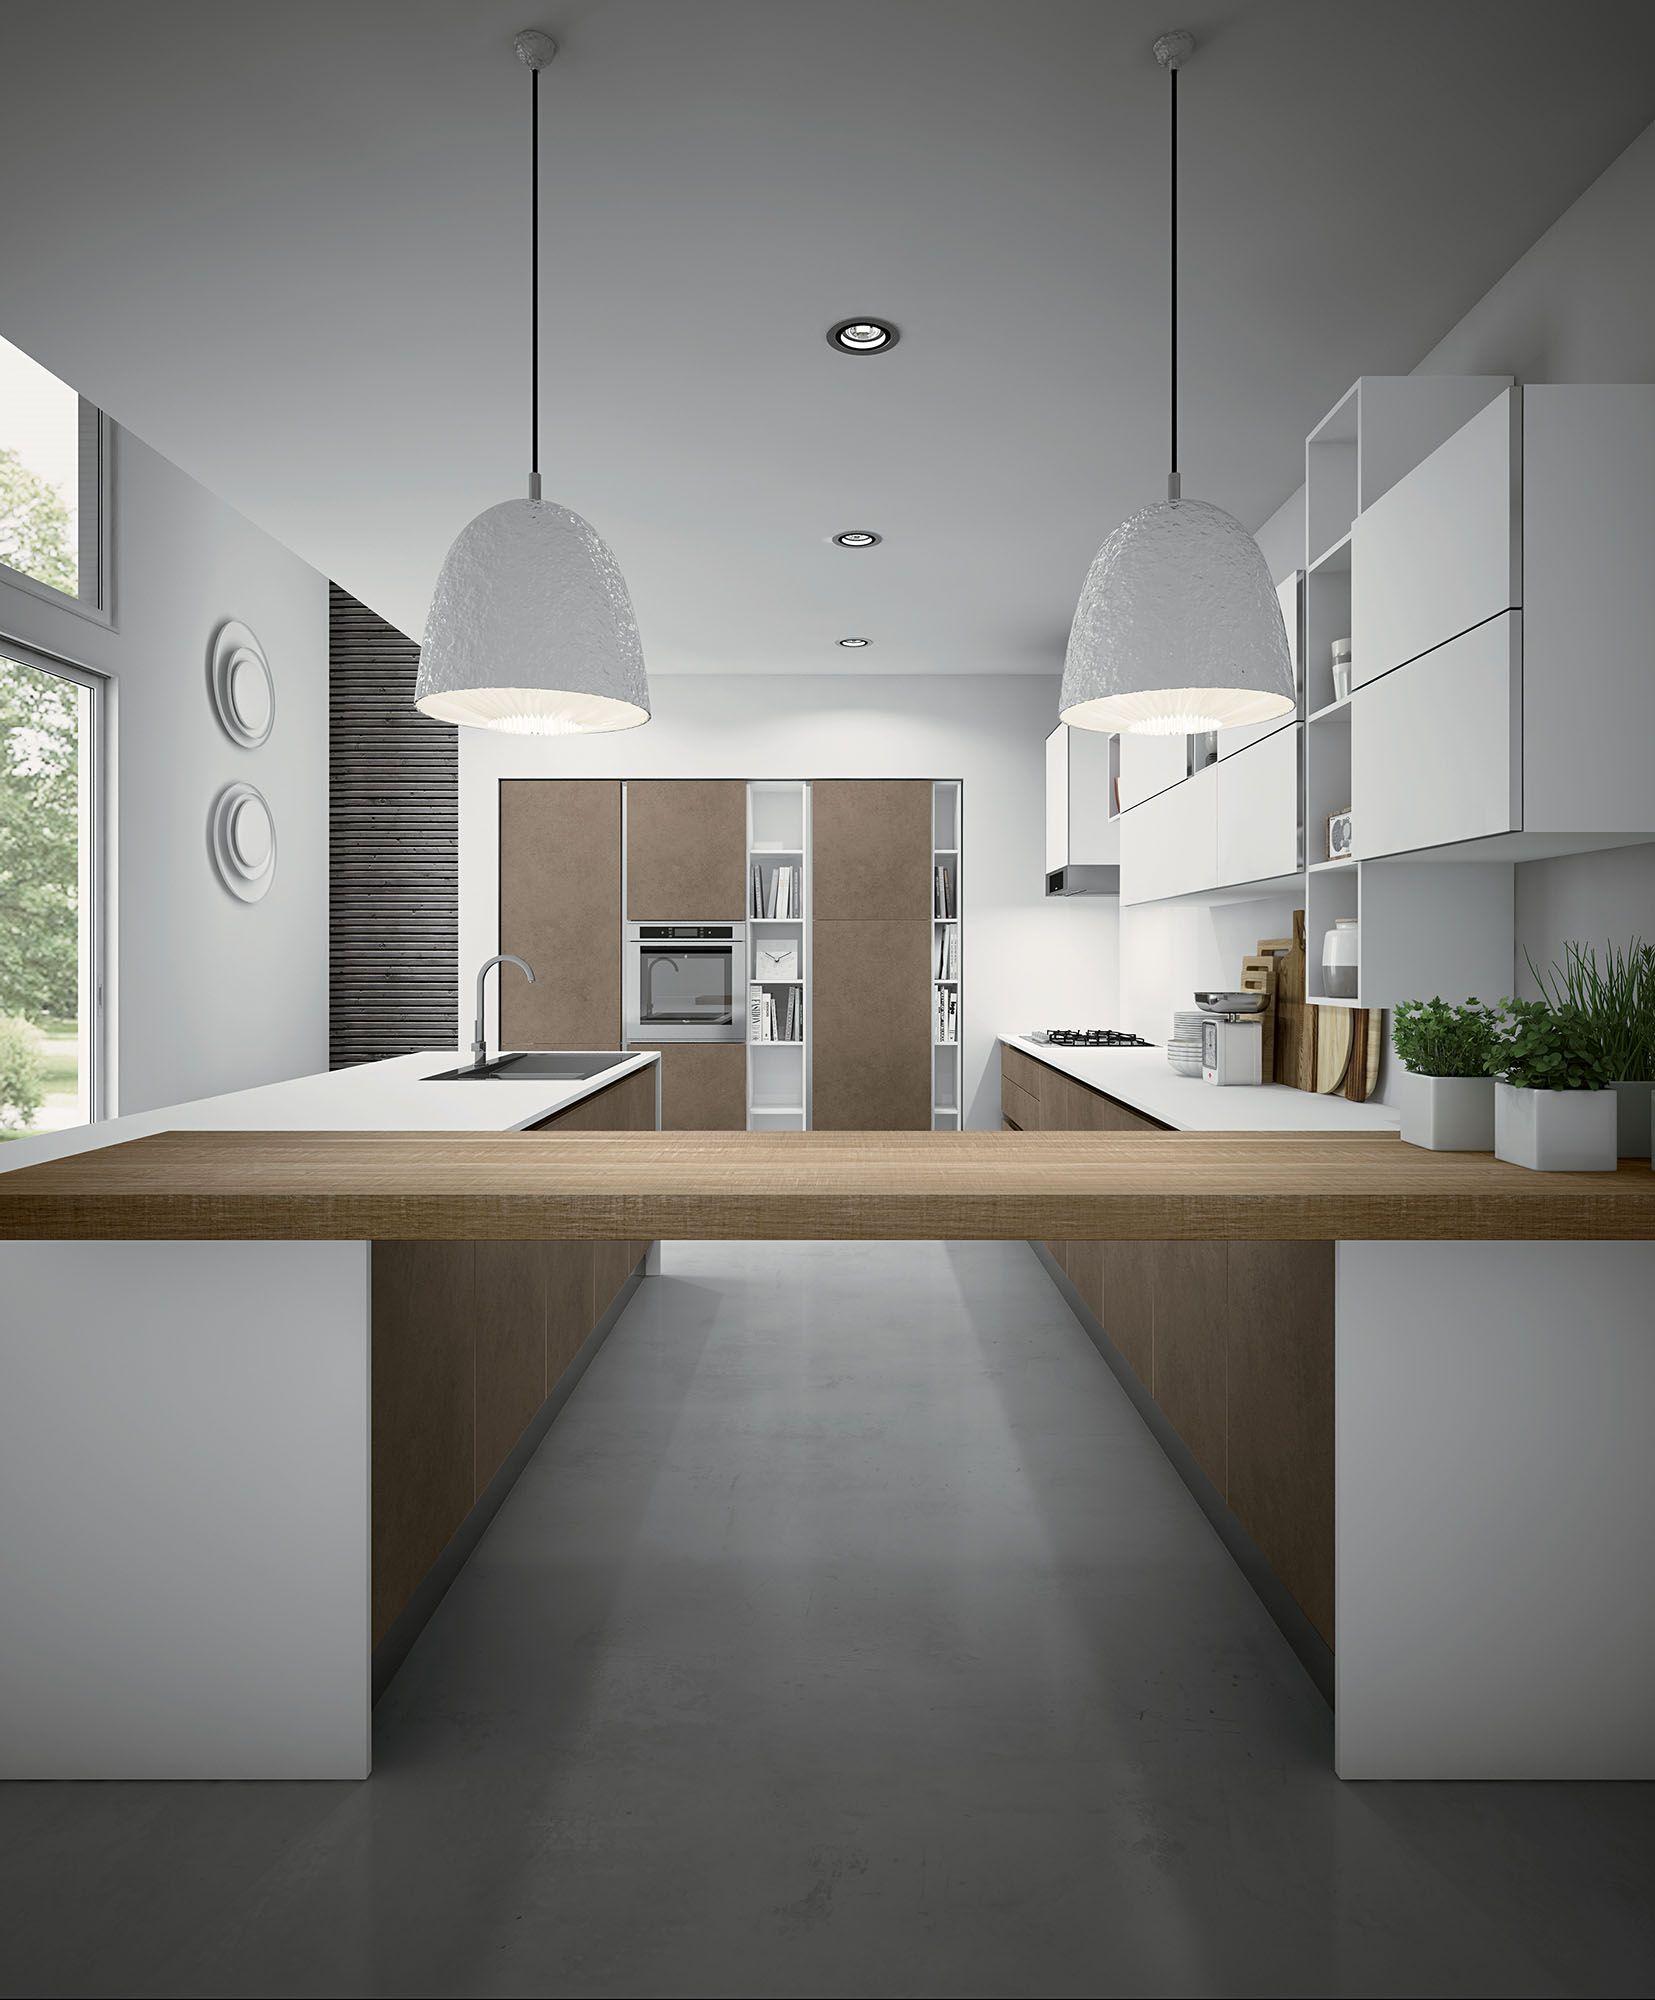 Miro Colours By Aran Cucine European Cabinets Design Studios Modern Kitchen Cabinets Interior Design Kitchen Compact Kitchen Design